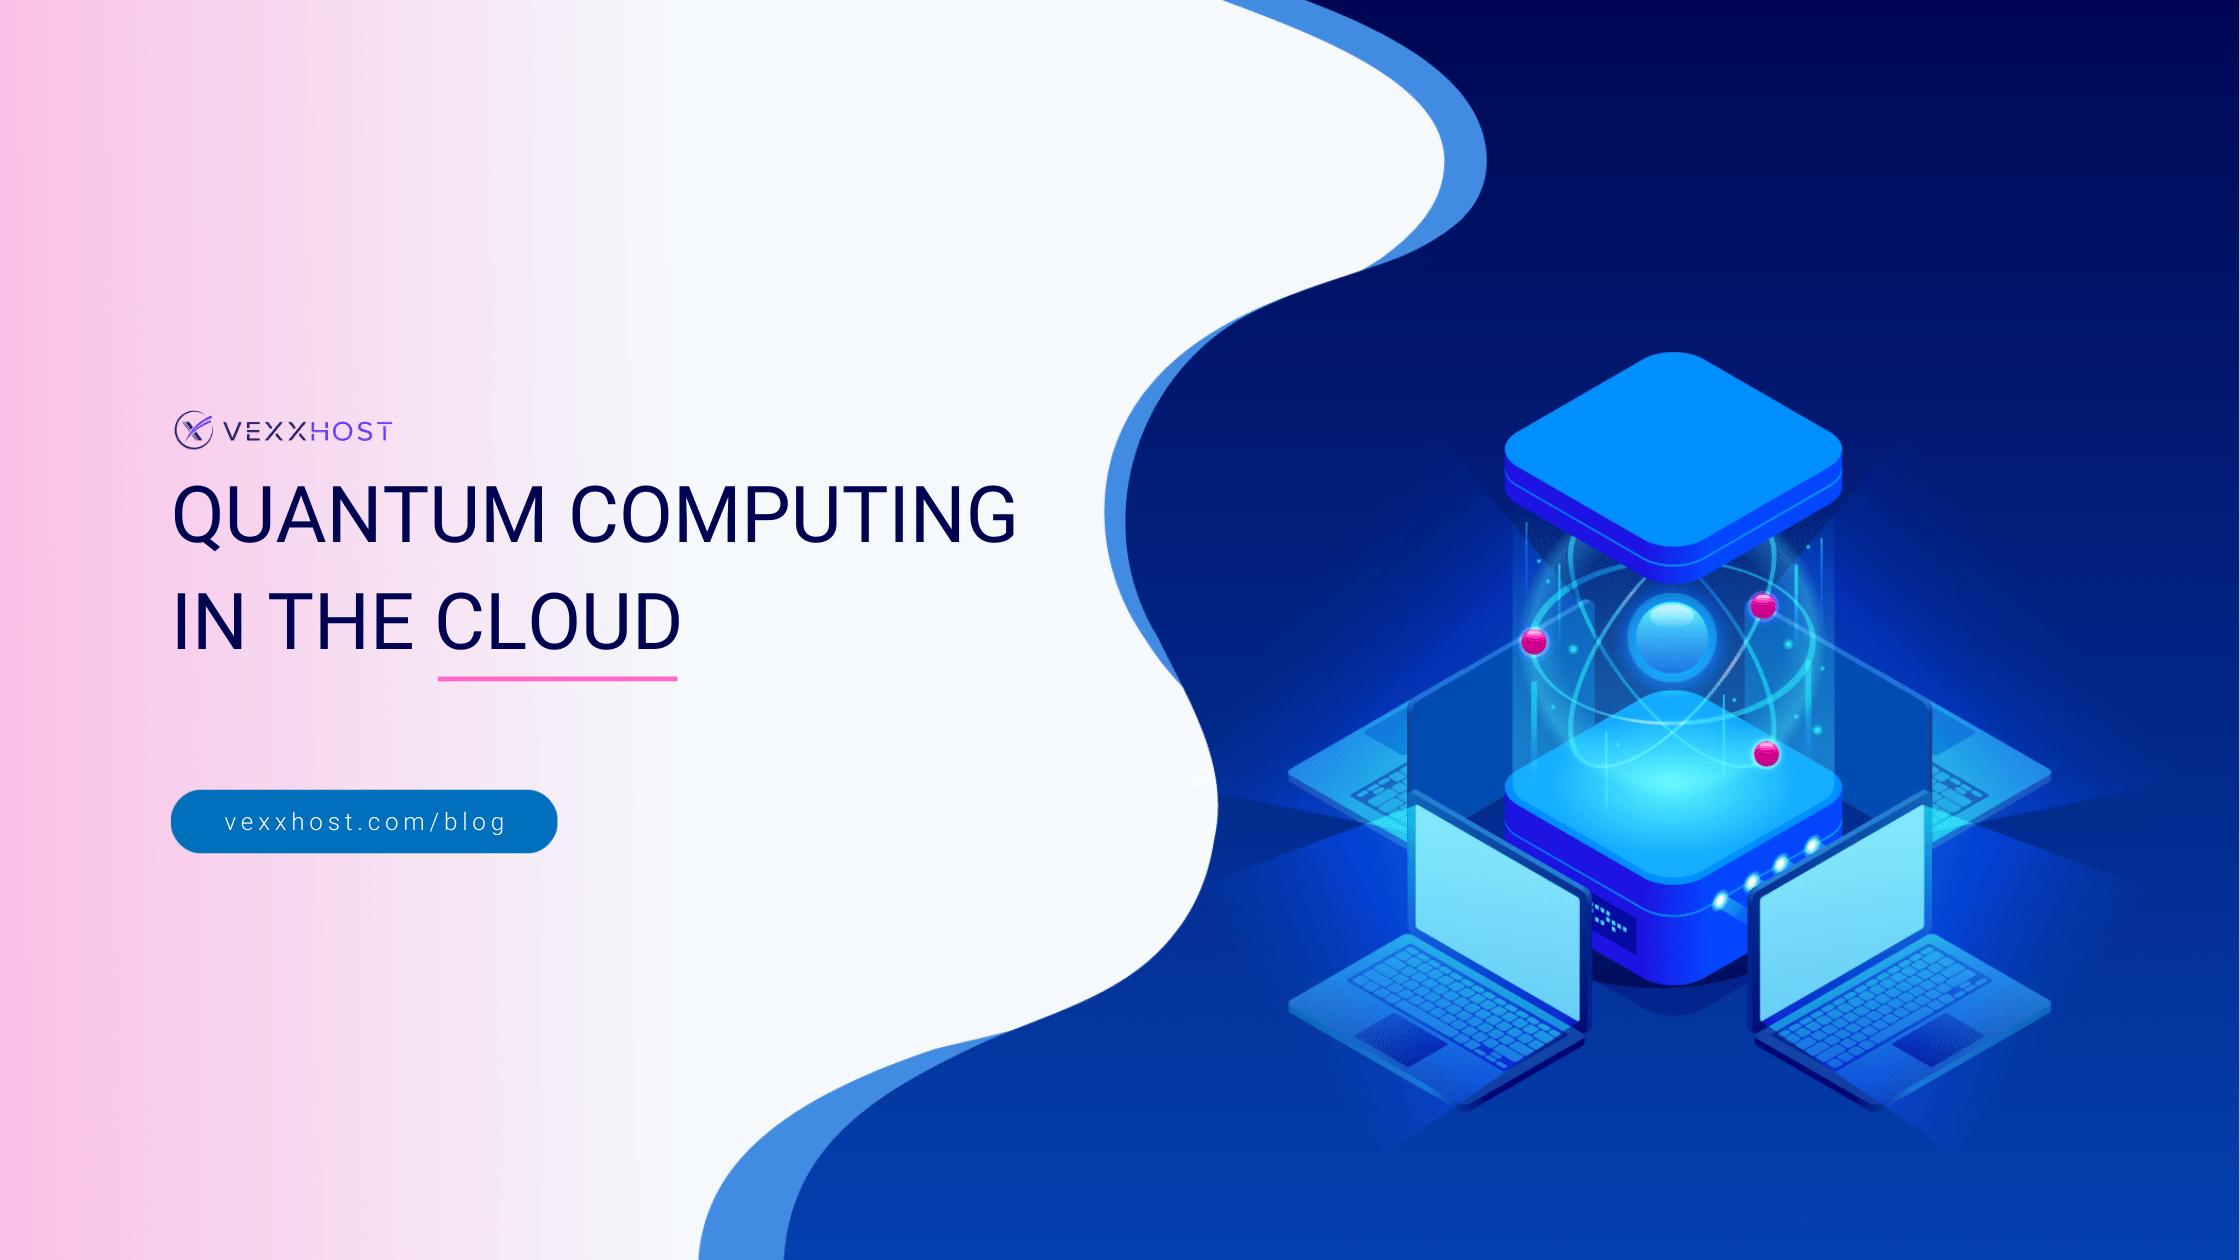 quantum-computing-in-the-cloud-vexxhost-blog-header